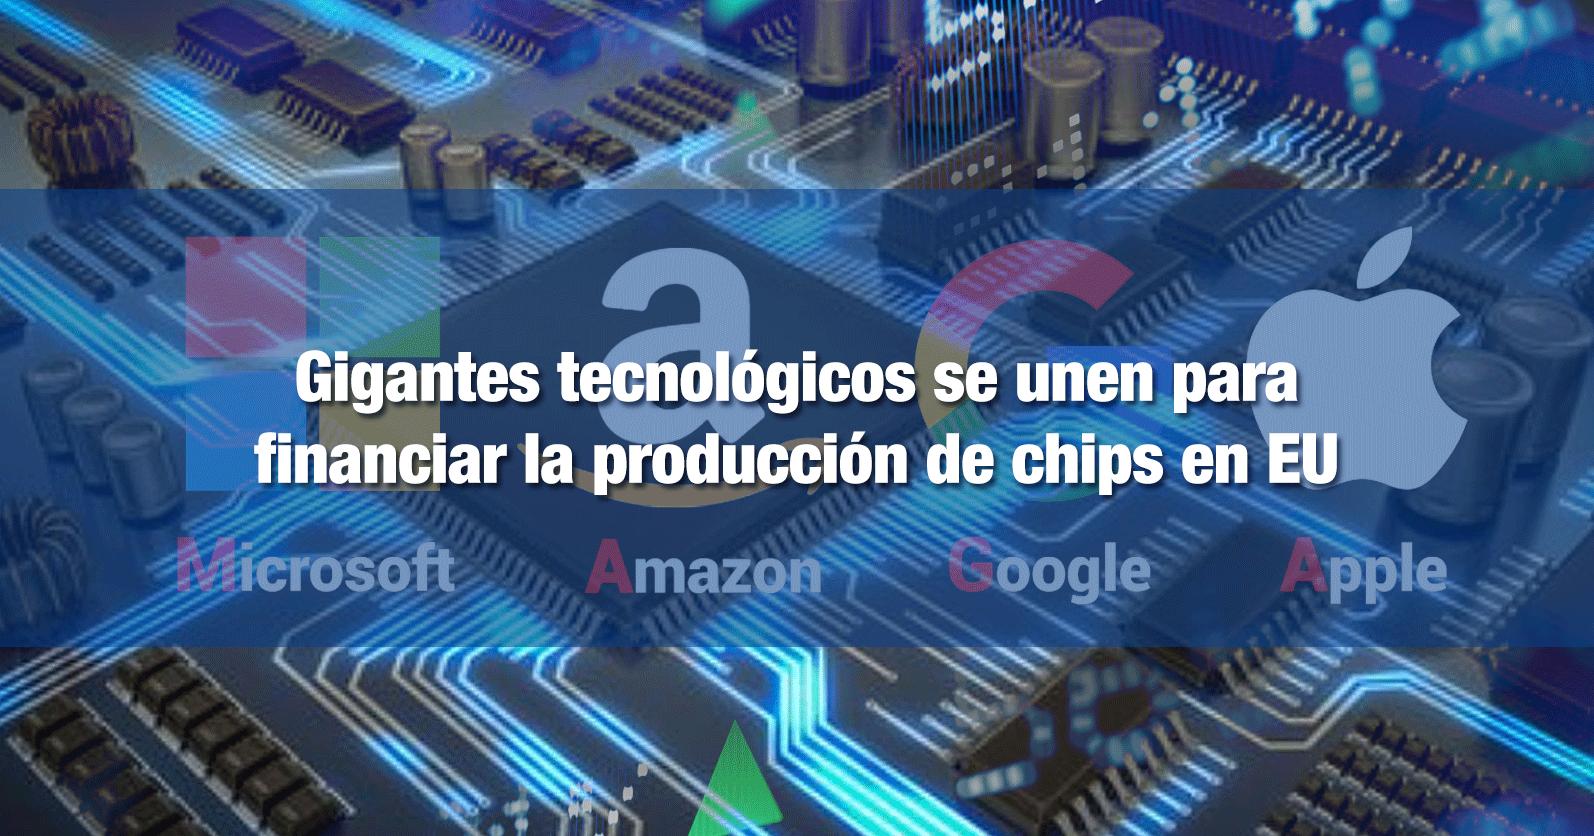 Gigantes tecnológicos se unen para financiar la producción de chips en EU